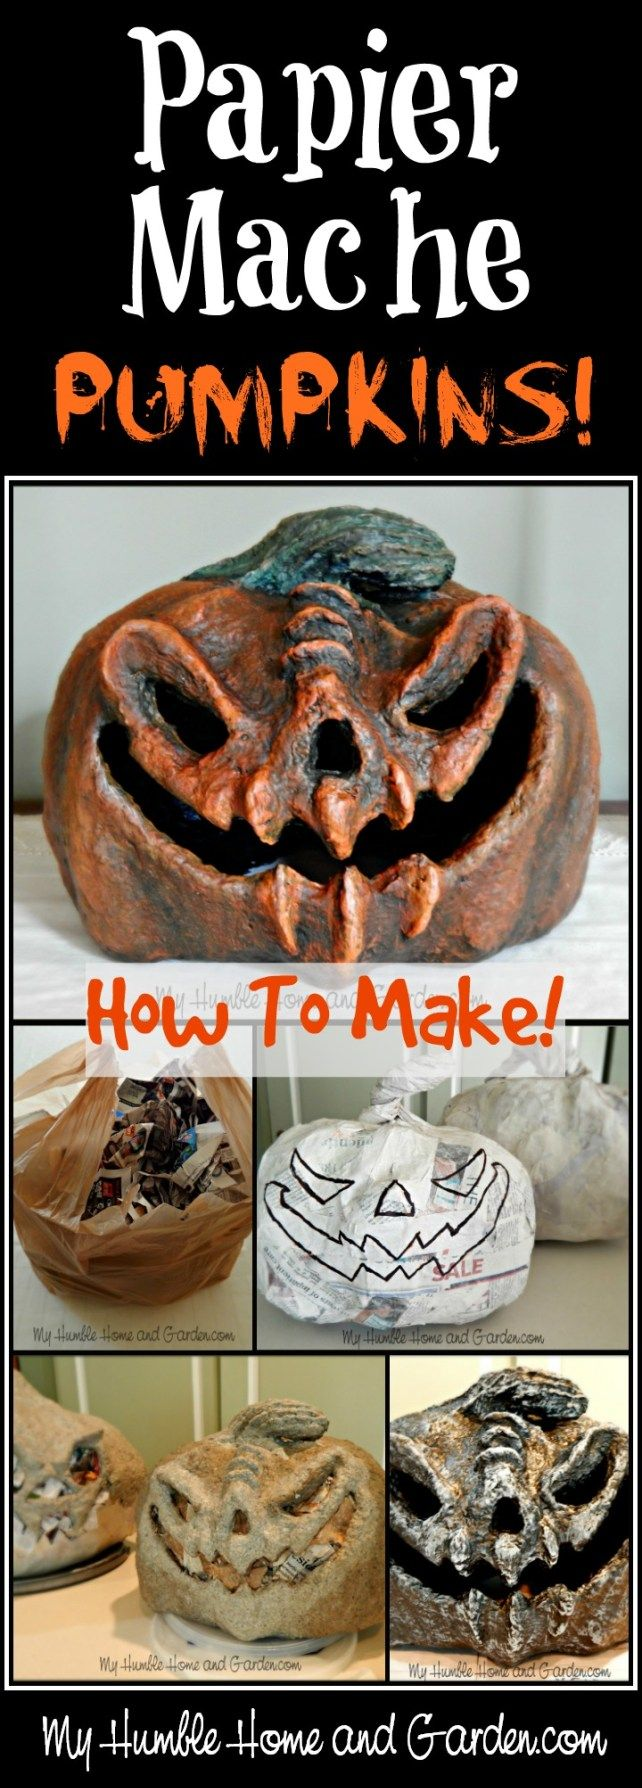 Papier-mâché - Pumpkins How To Make - My Humble Home and Garden